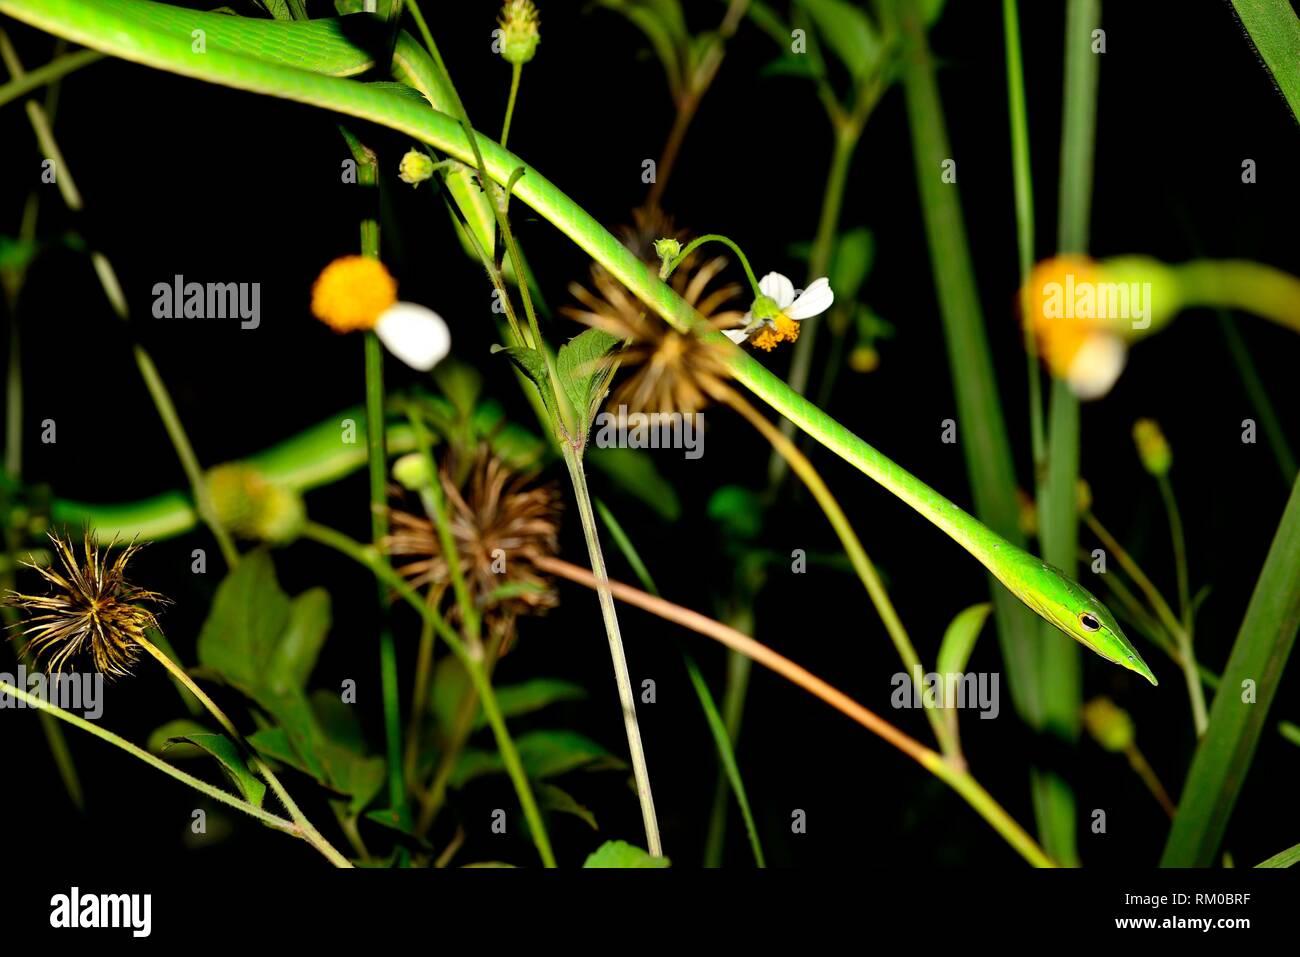 Serpent de vigne verte (Ahaetulla nasuta) entre les plantes près de Sen Monorom, Mondulkiri, Cambodge Banque D'Images